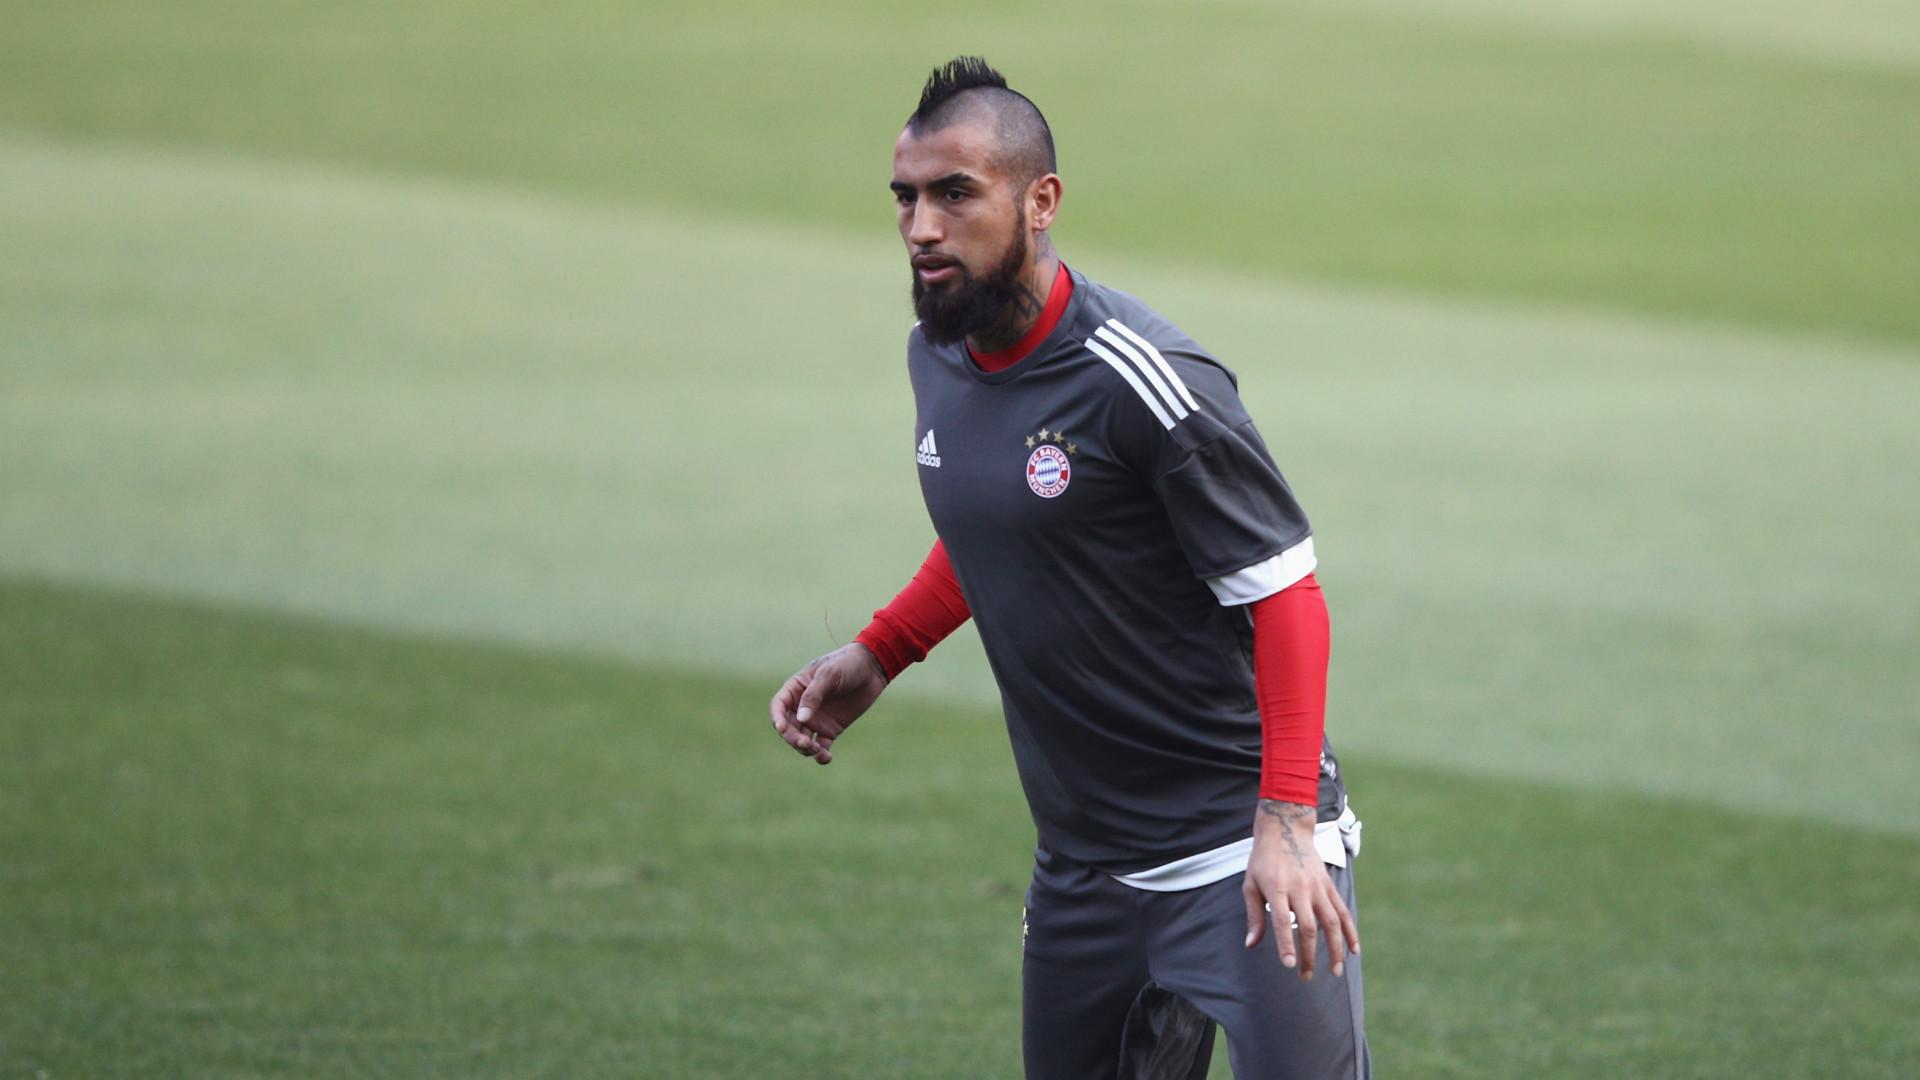 FC Bayern: Comeback muss warten! Vidal bricht Training ab